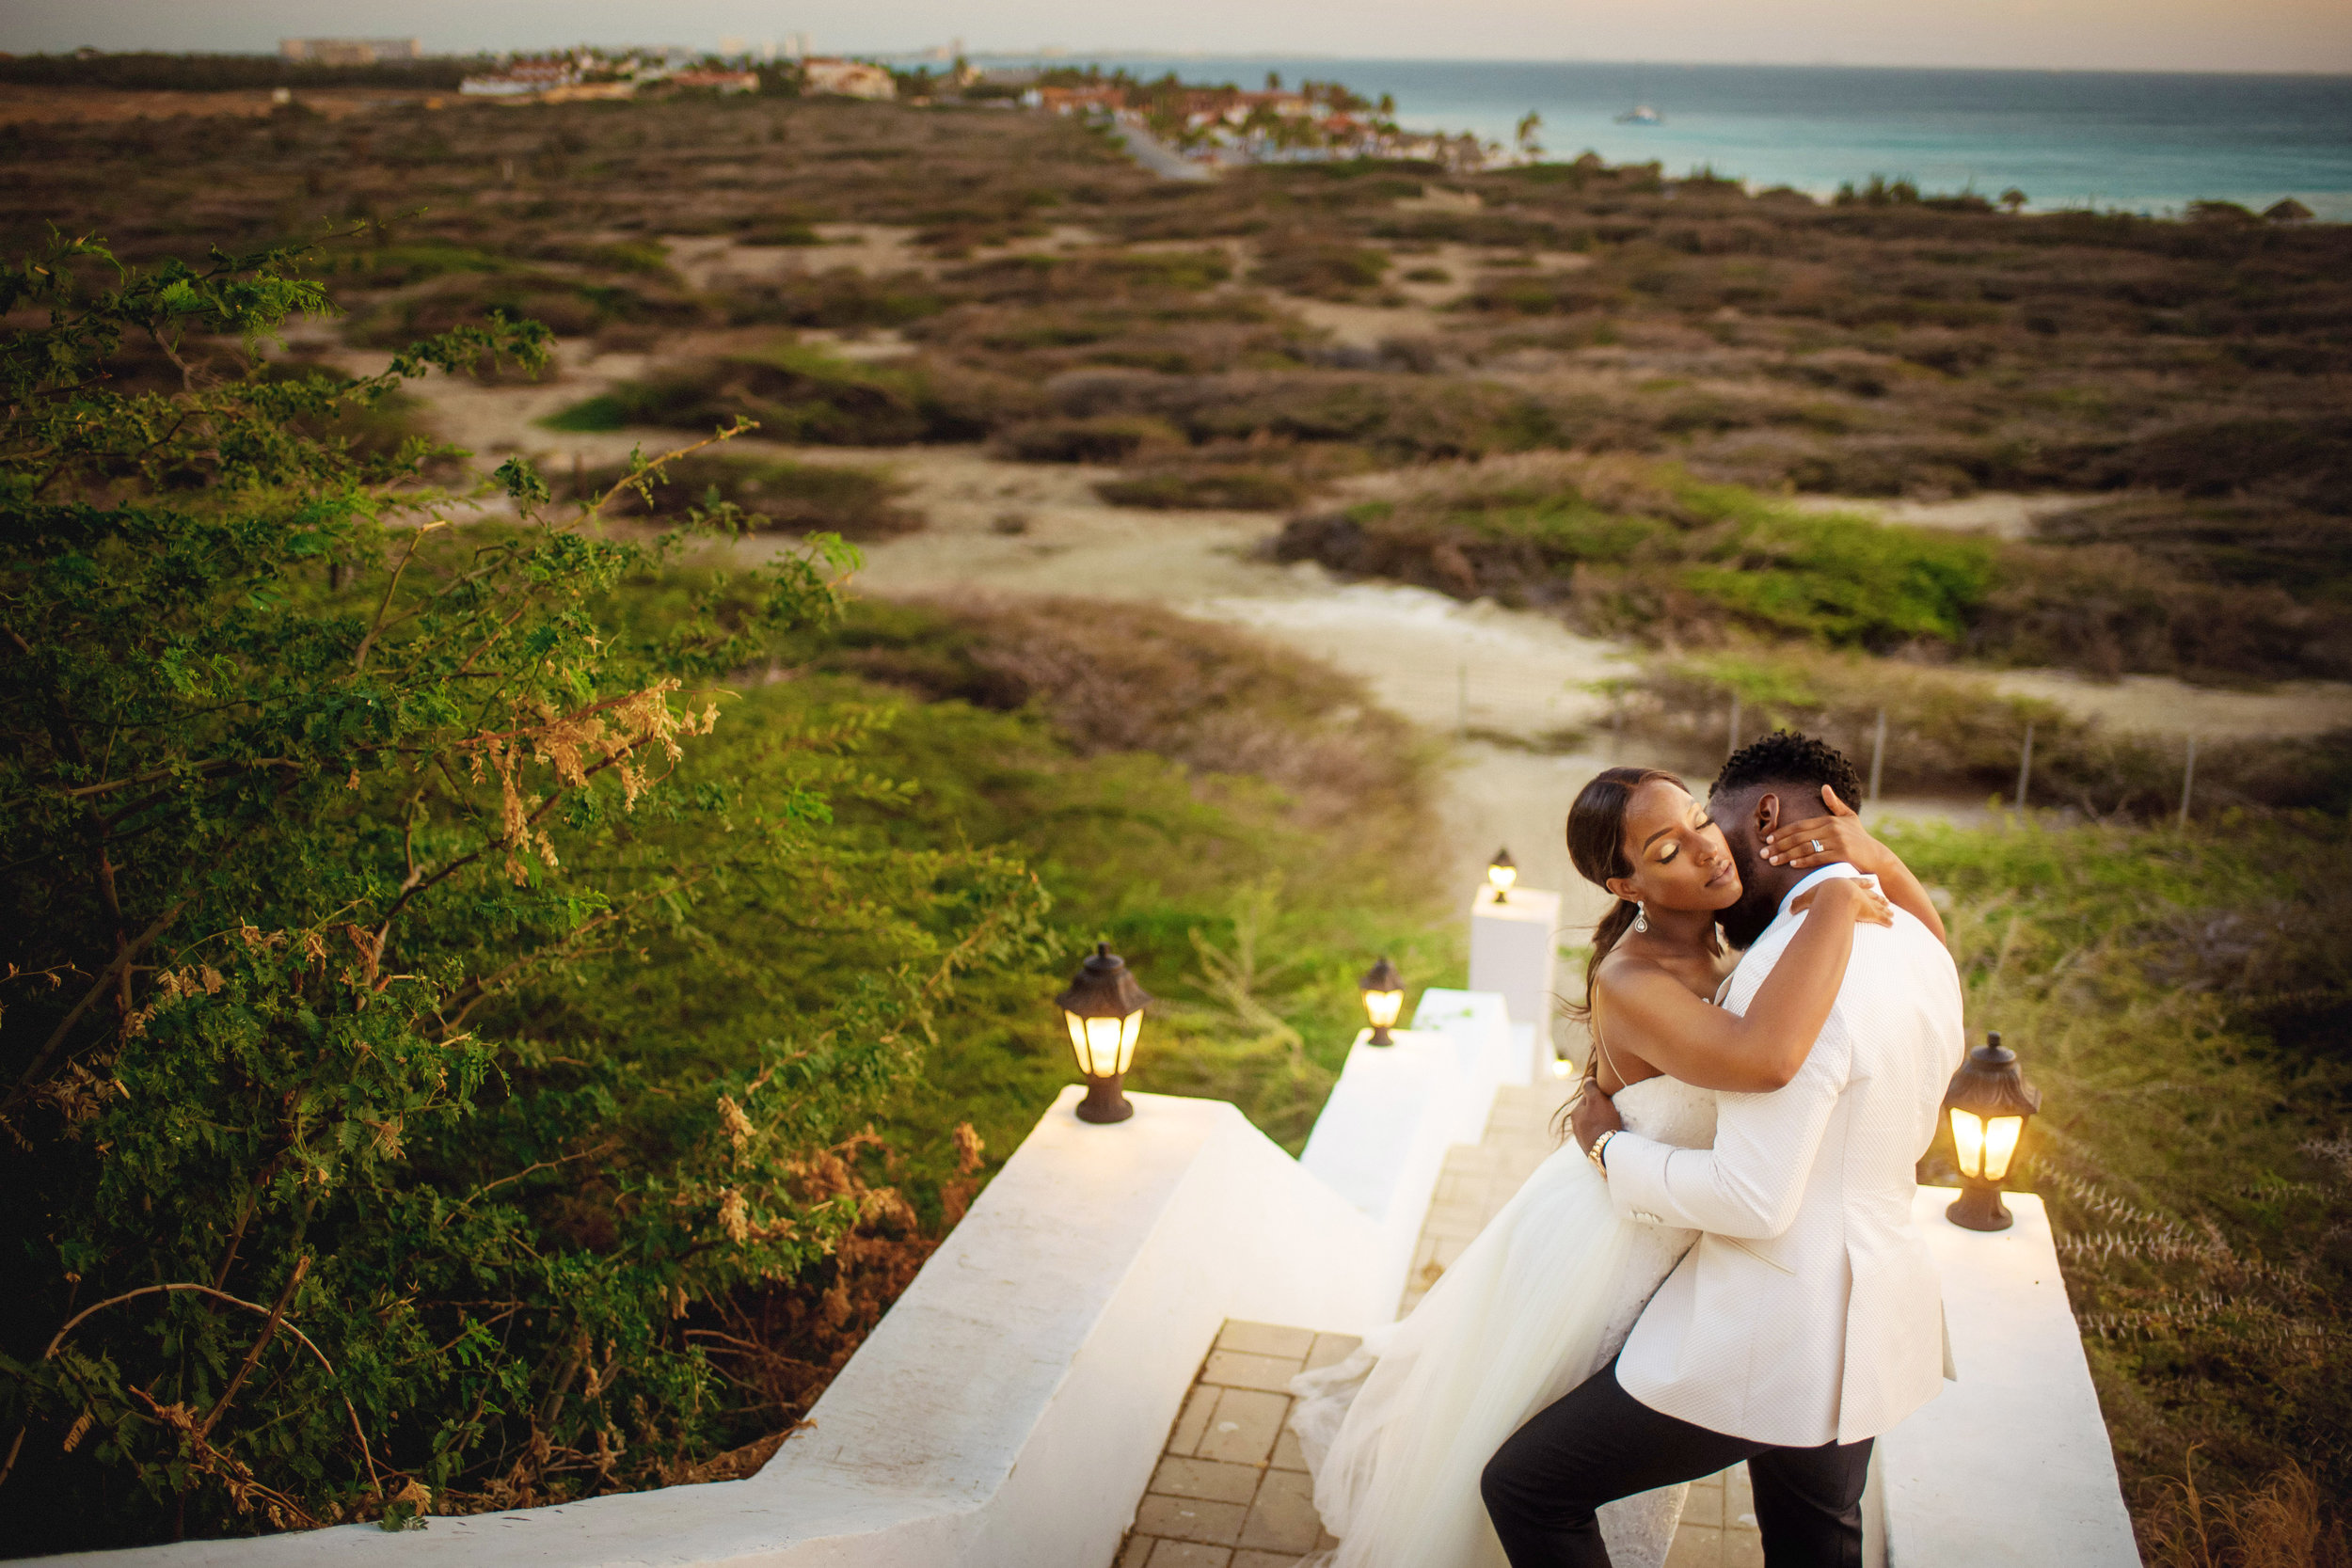 2017-09-02-Wedding-Jide Alakija-Aruba-Charles and Claire-00322.jpg